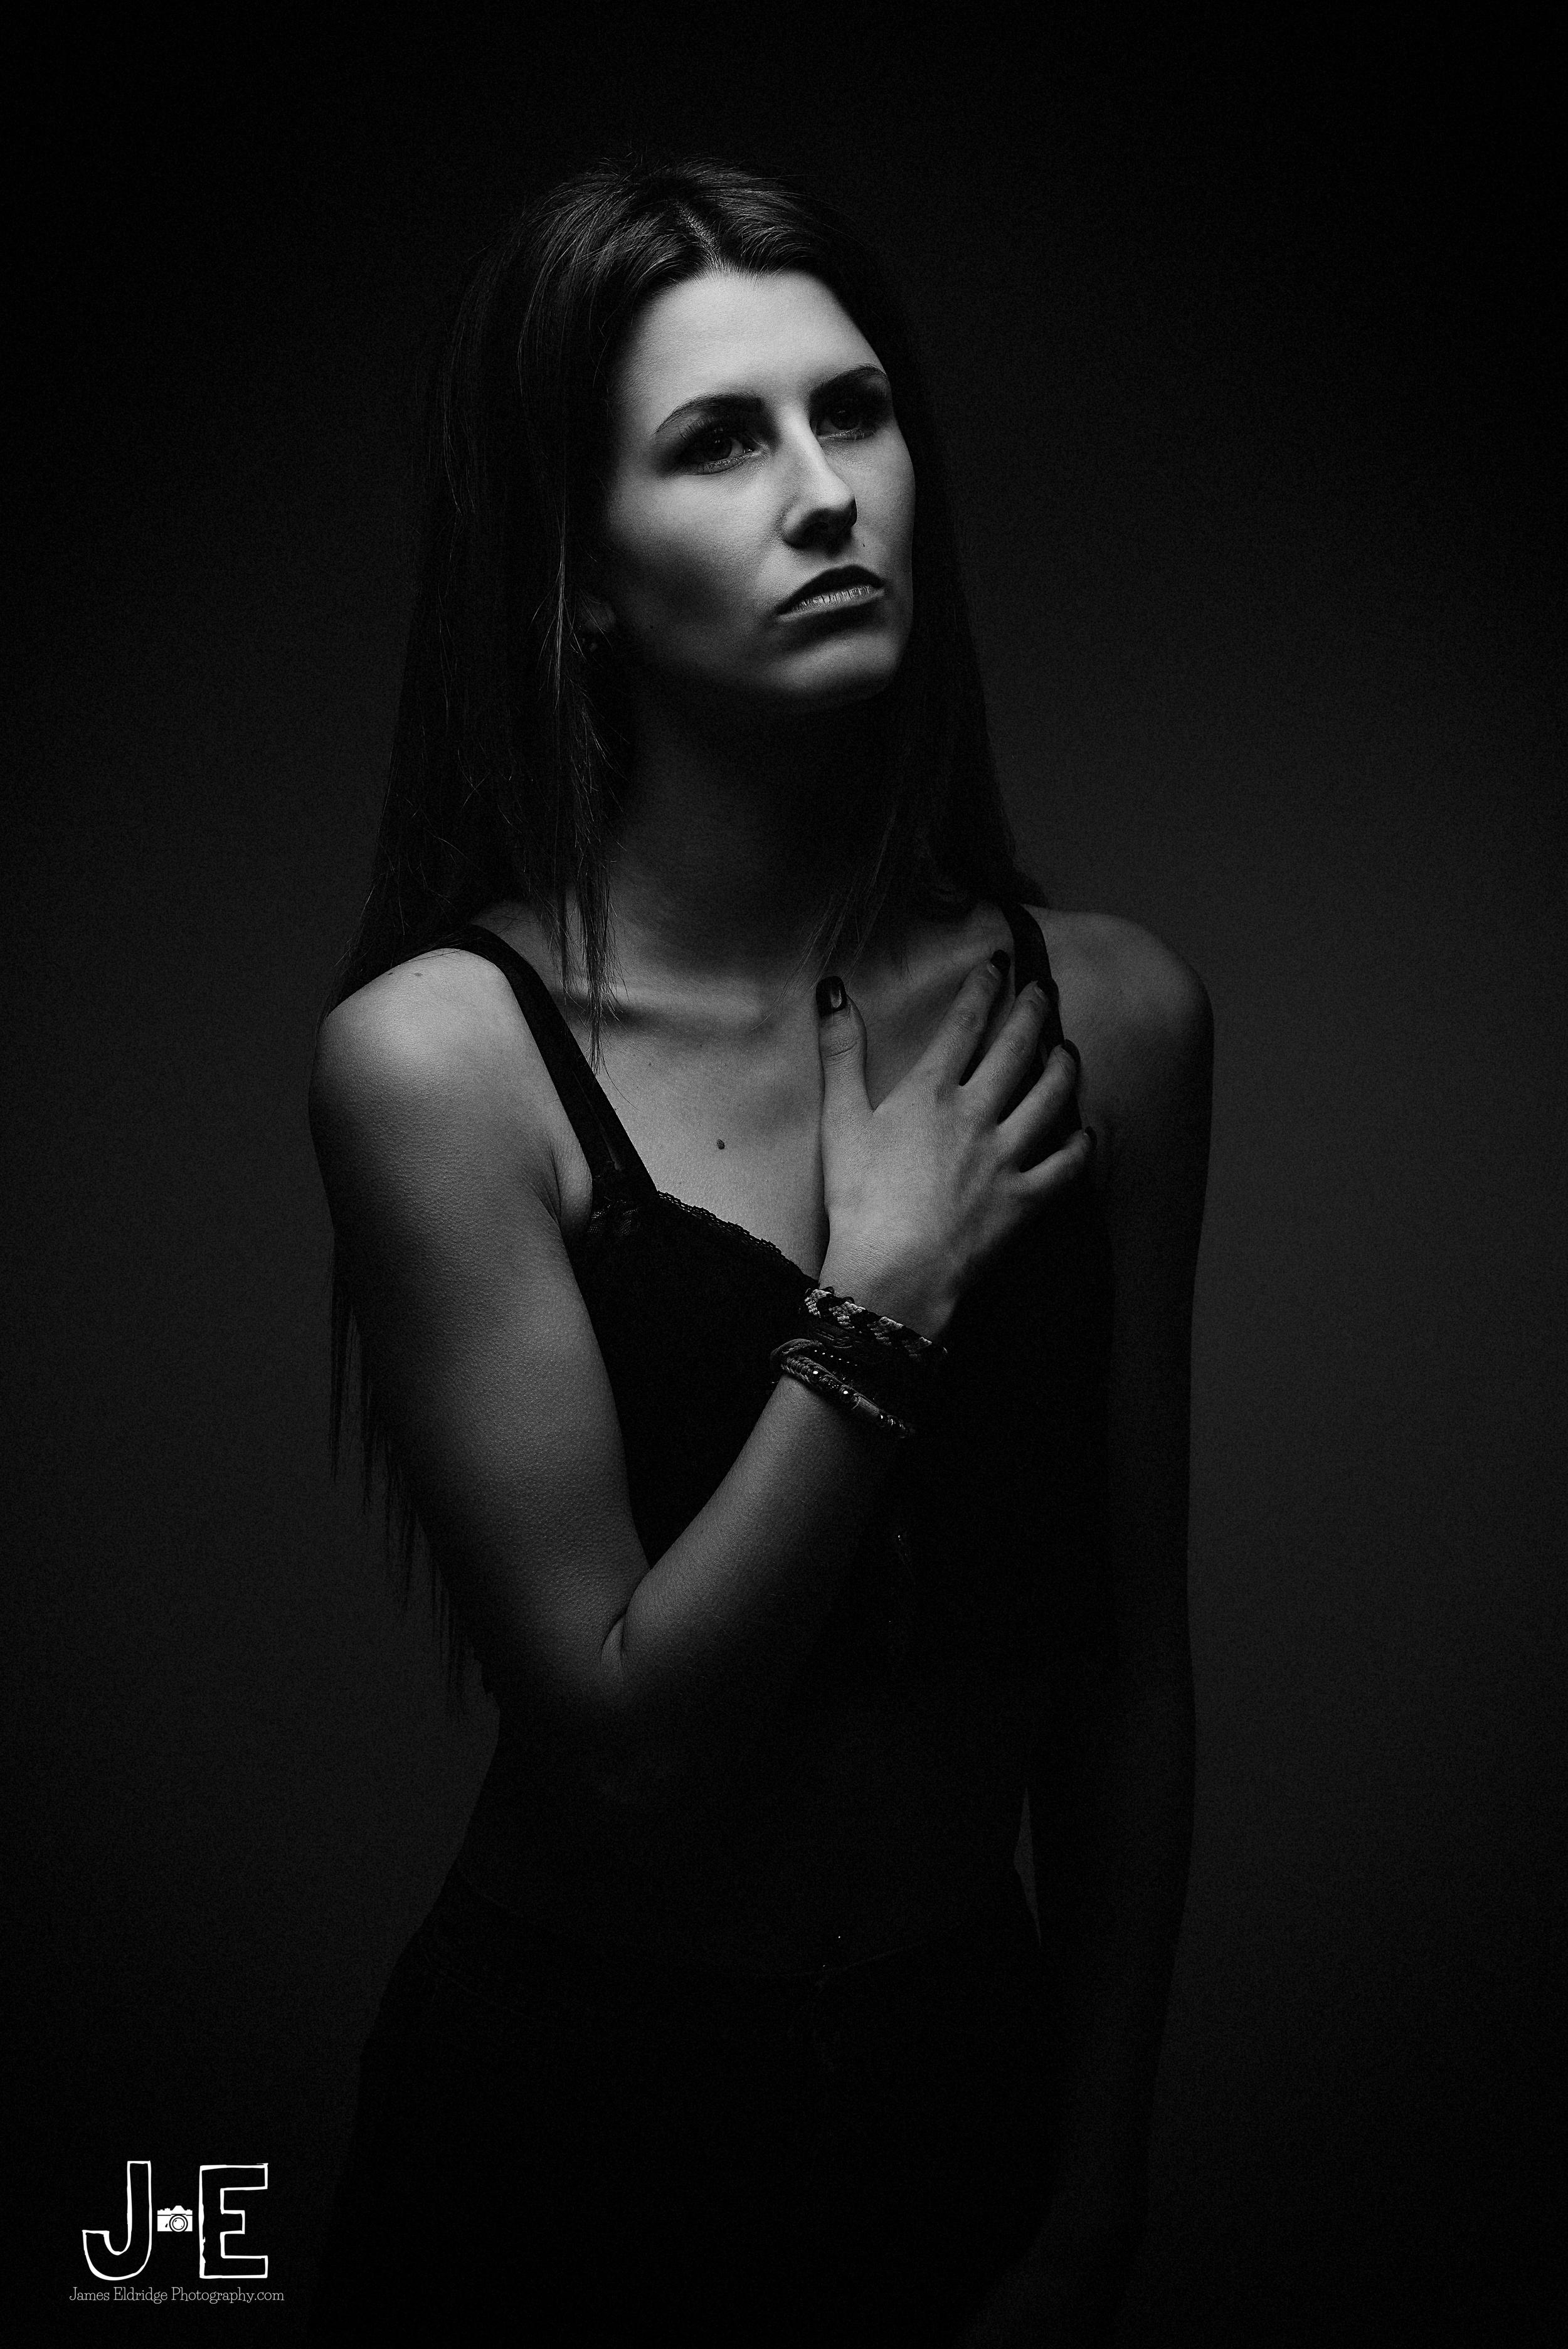 dark portrait studio